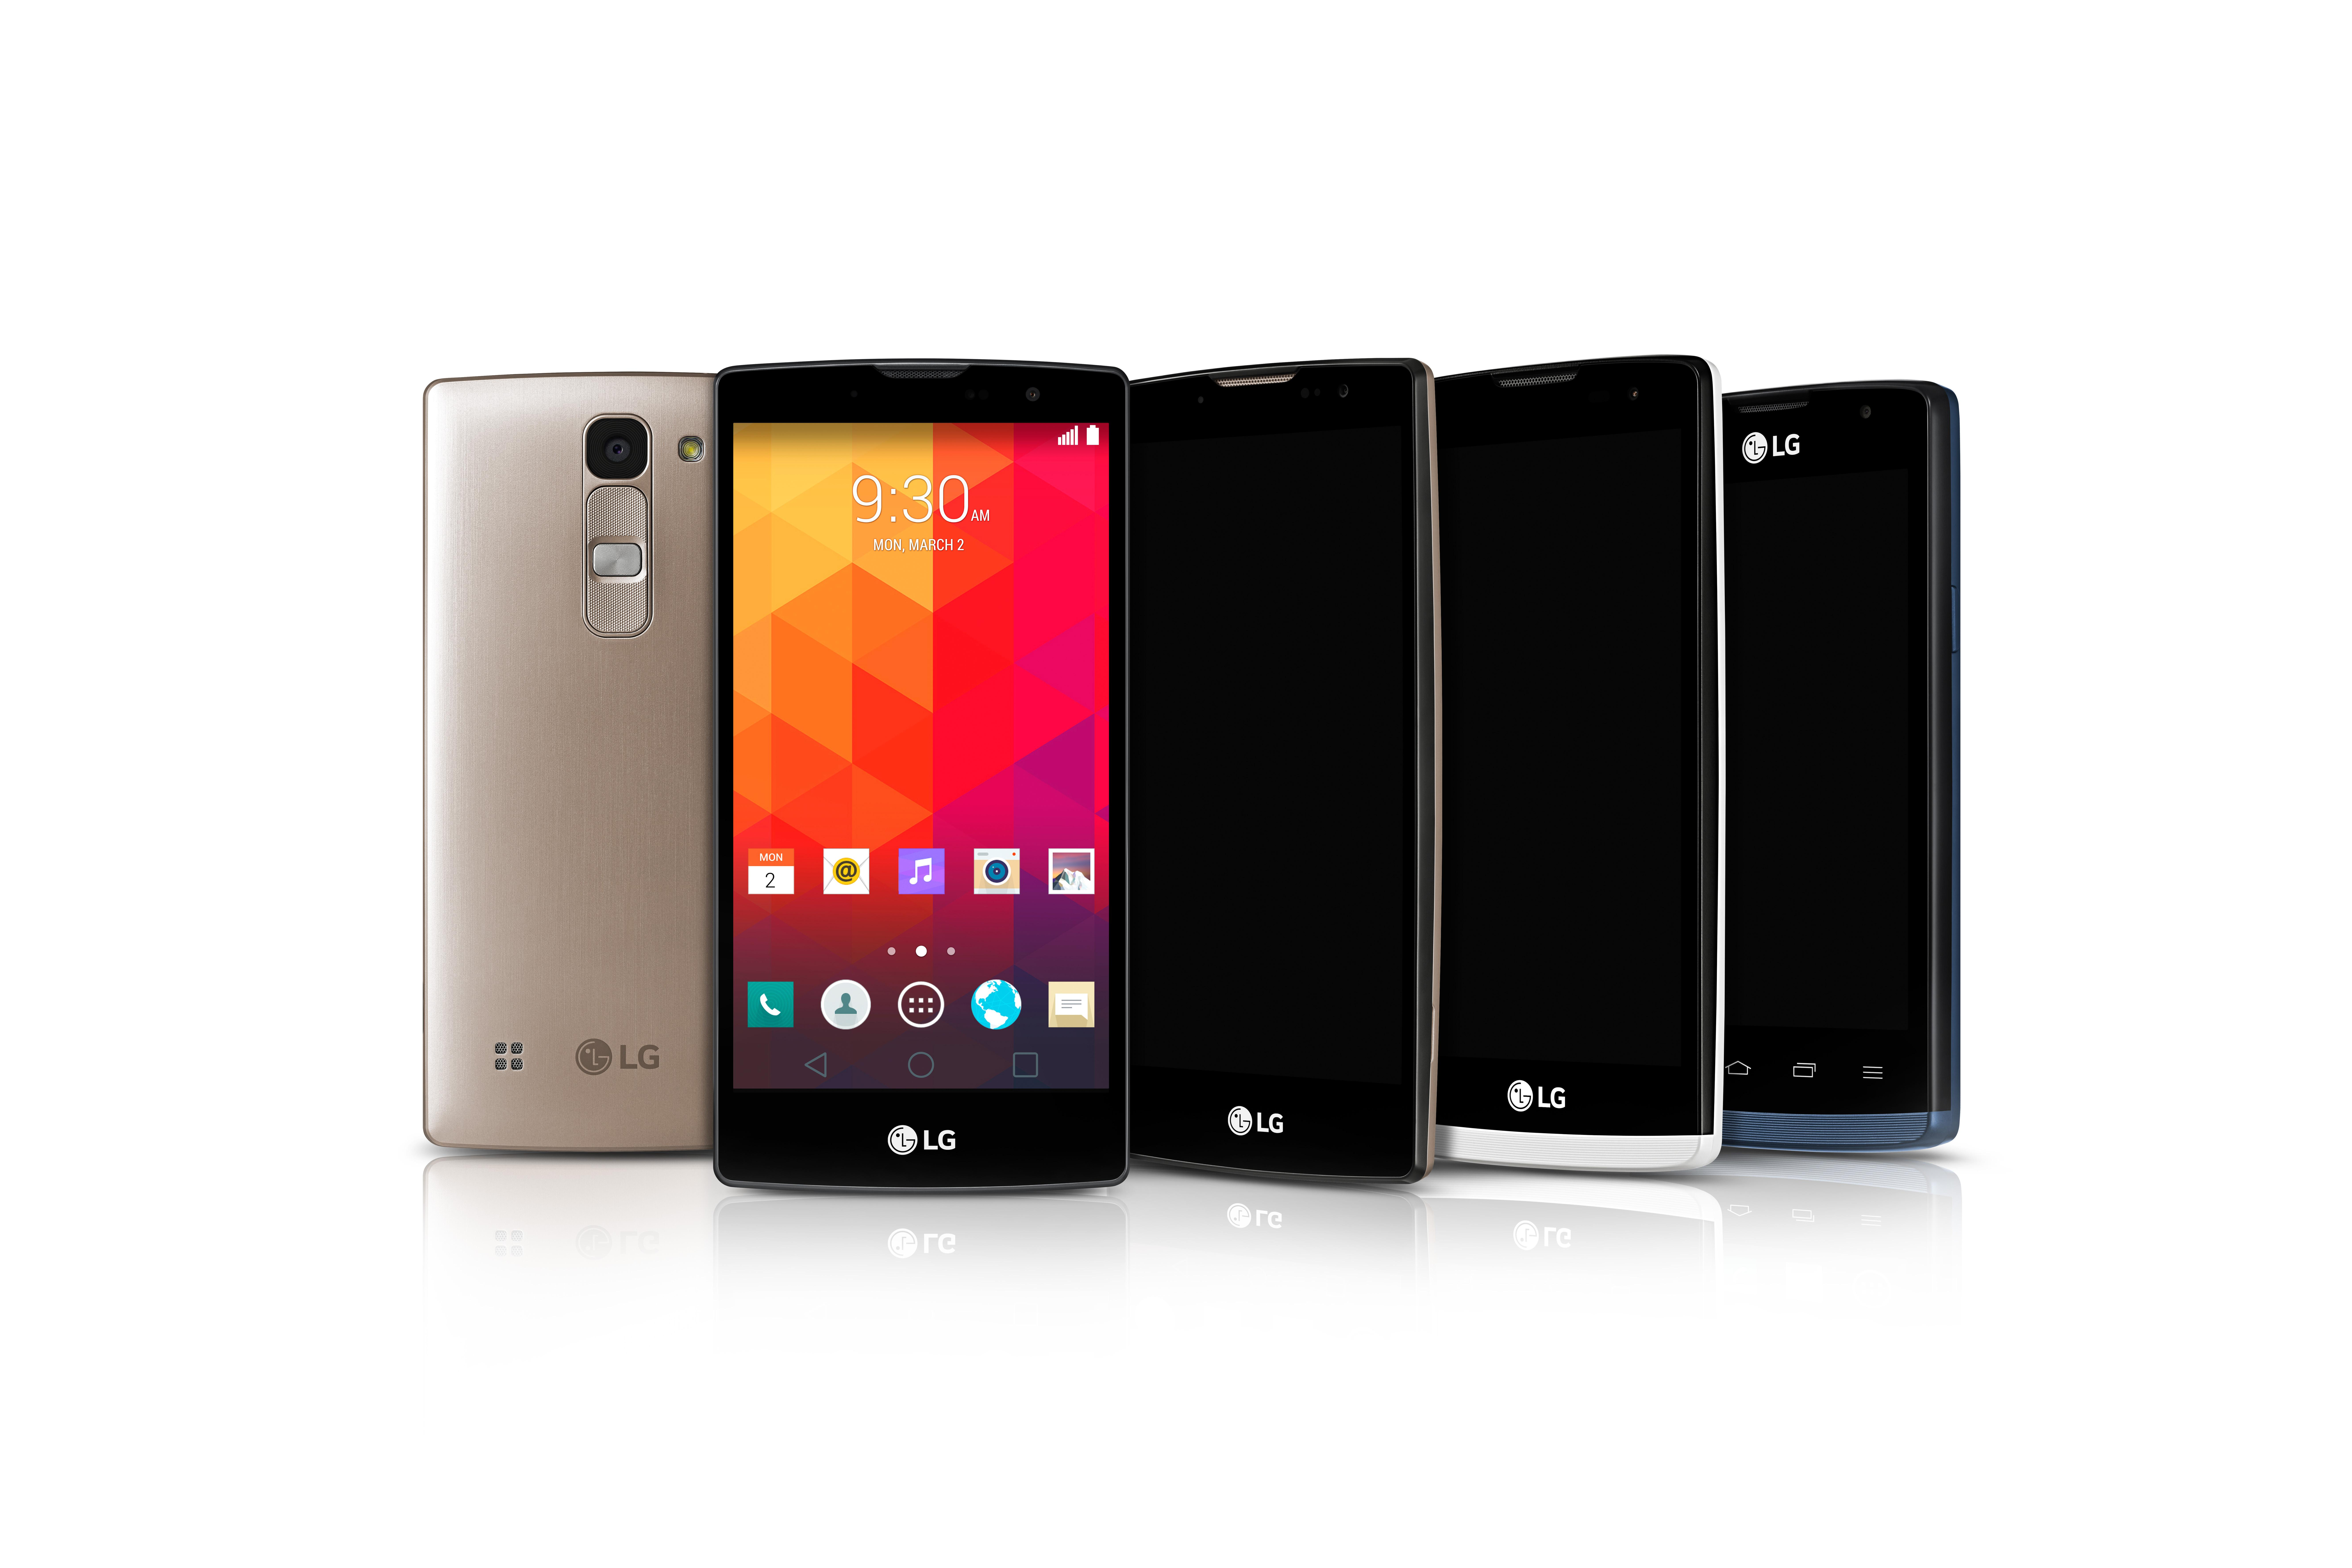 lg s new mid range smartphone lineup delivers premium. Black Bedroom Furniture Sets. Home Design Ideas